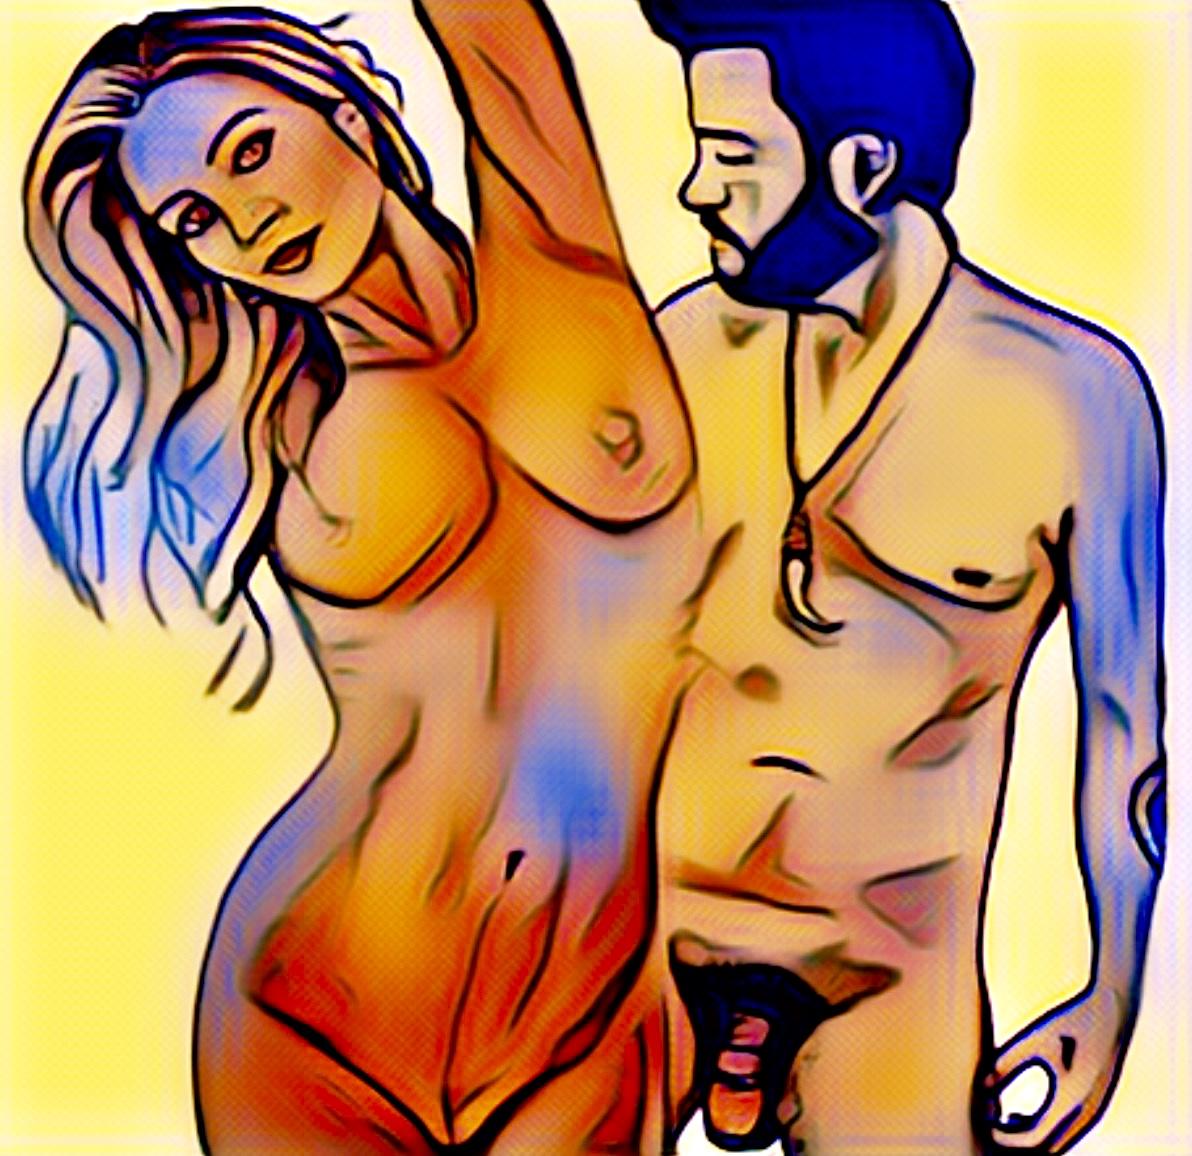 Digital pastel art